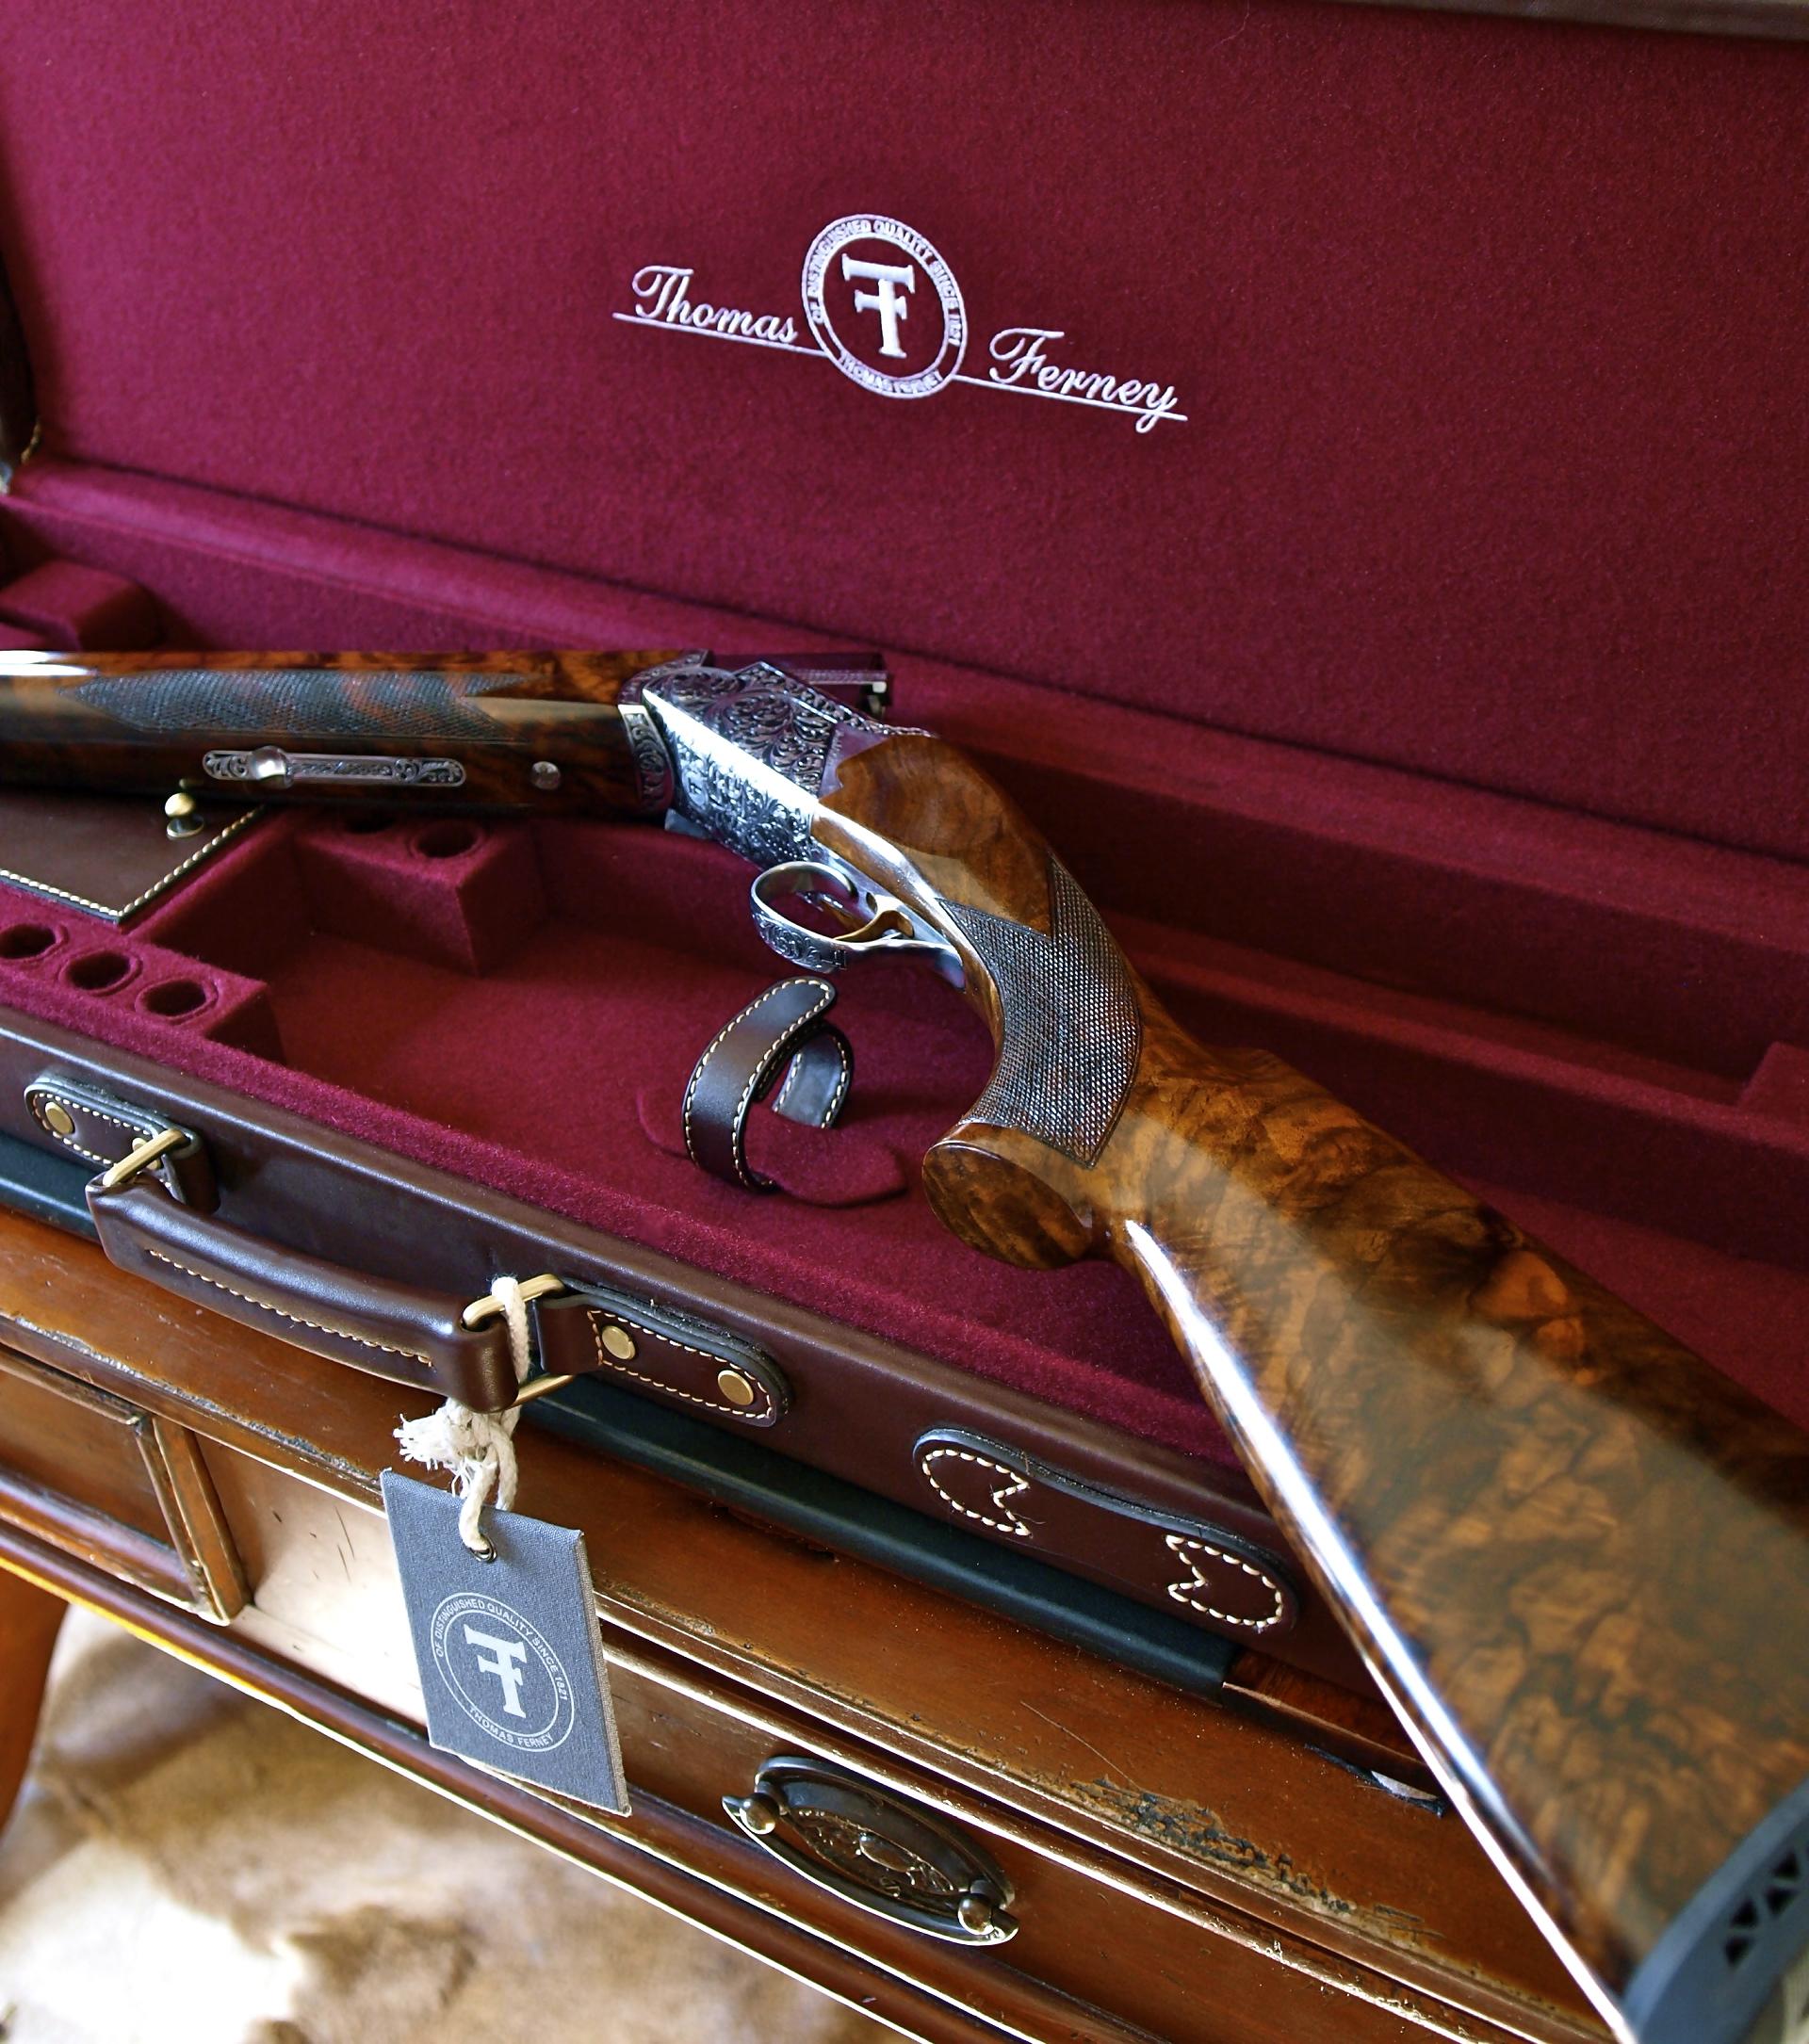 Leather-shotgun-case-on-table